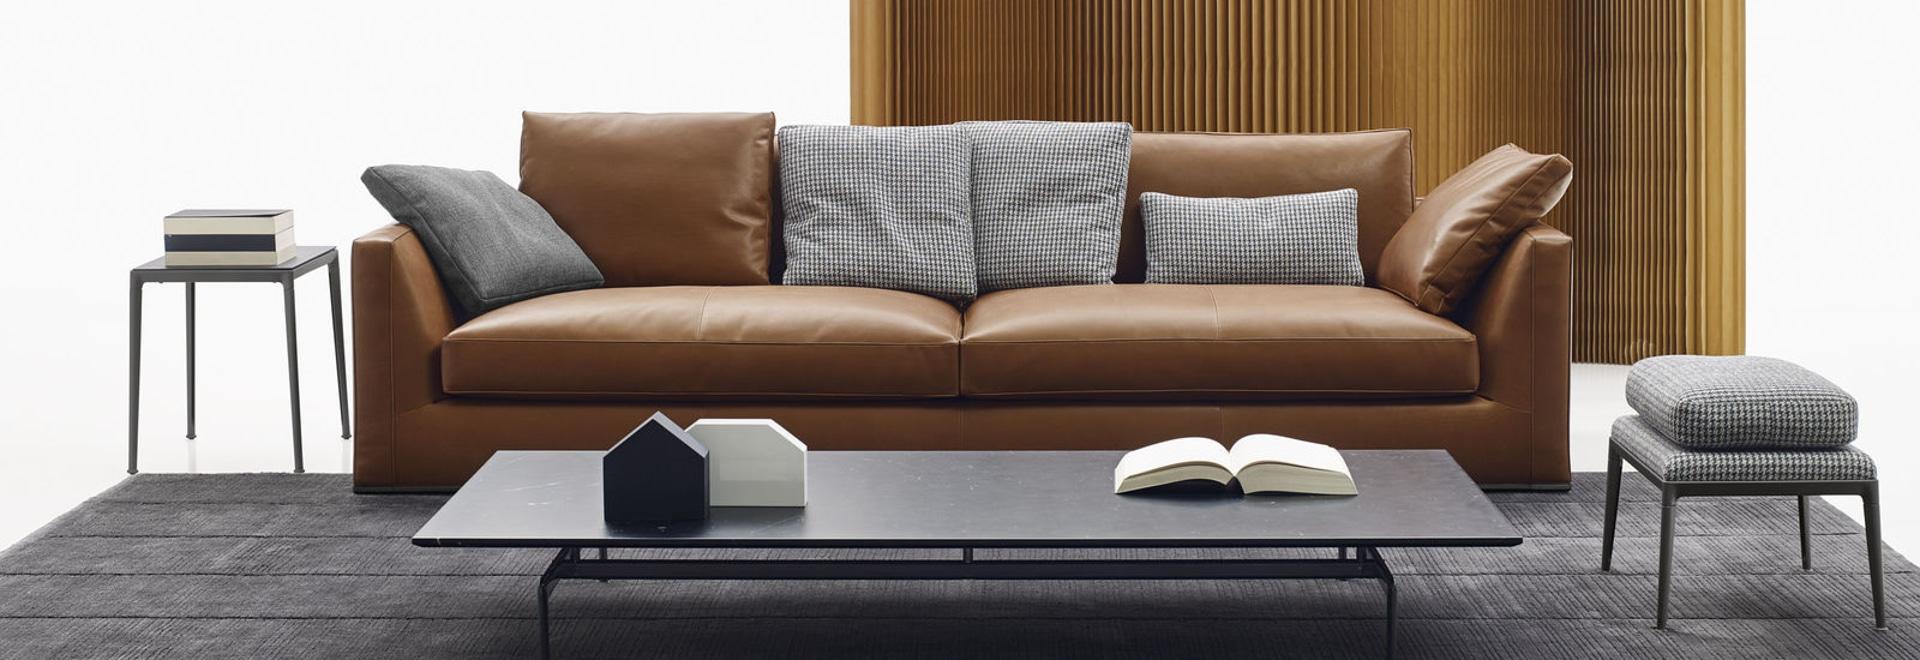 NEW: modular sofa by B&B Italia